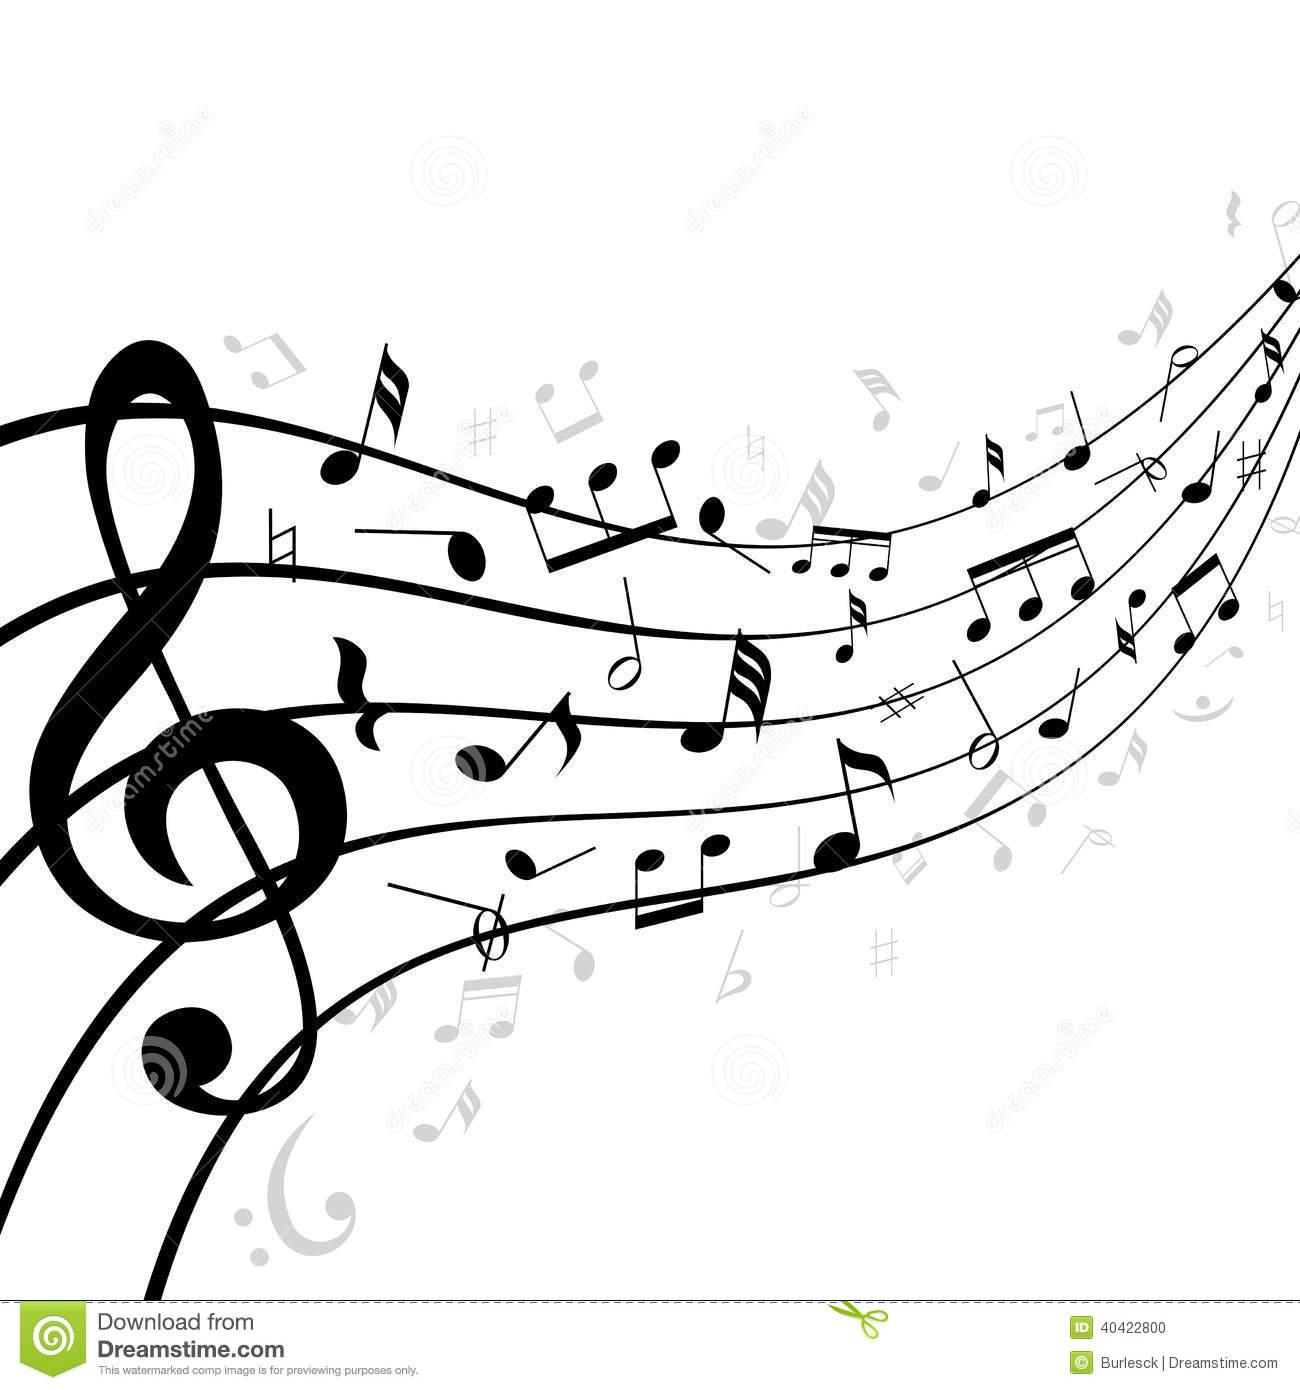 wavy music staff clipart